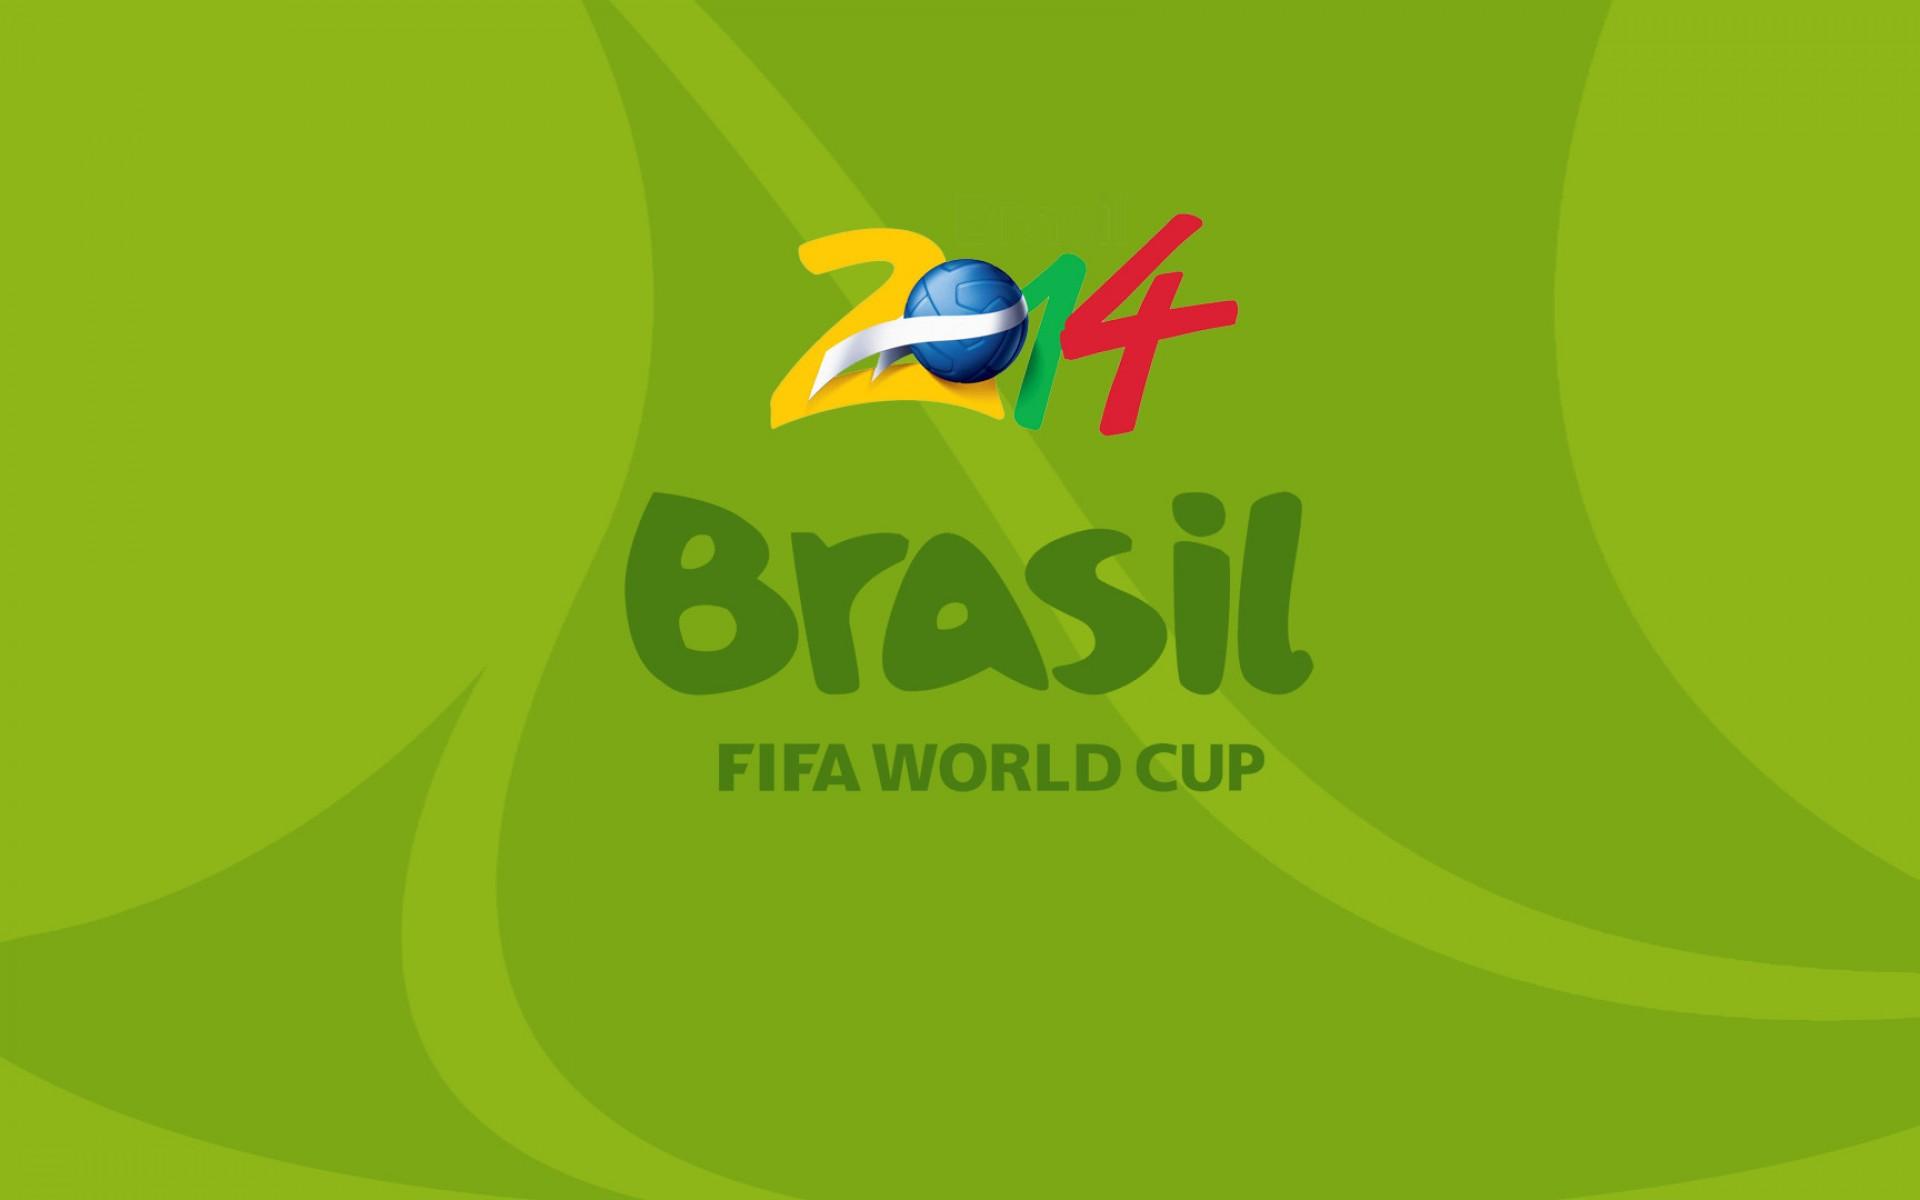 Fifa Brasil 2014 - 1920x1200